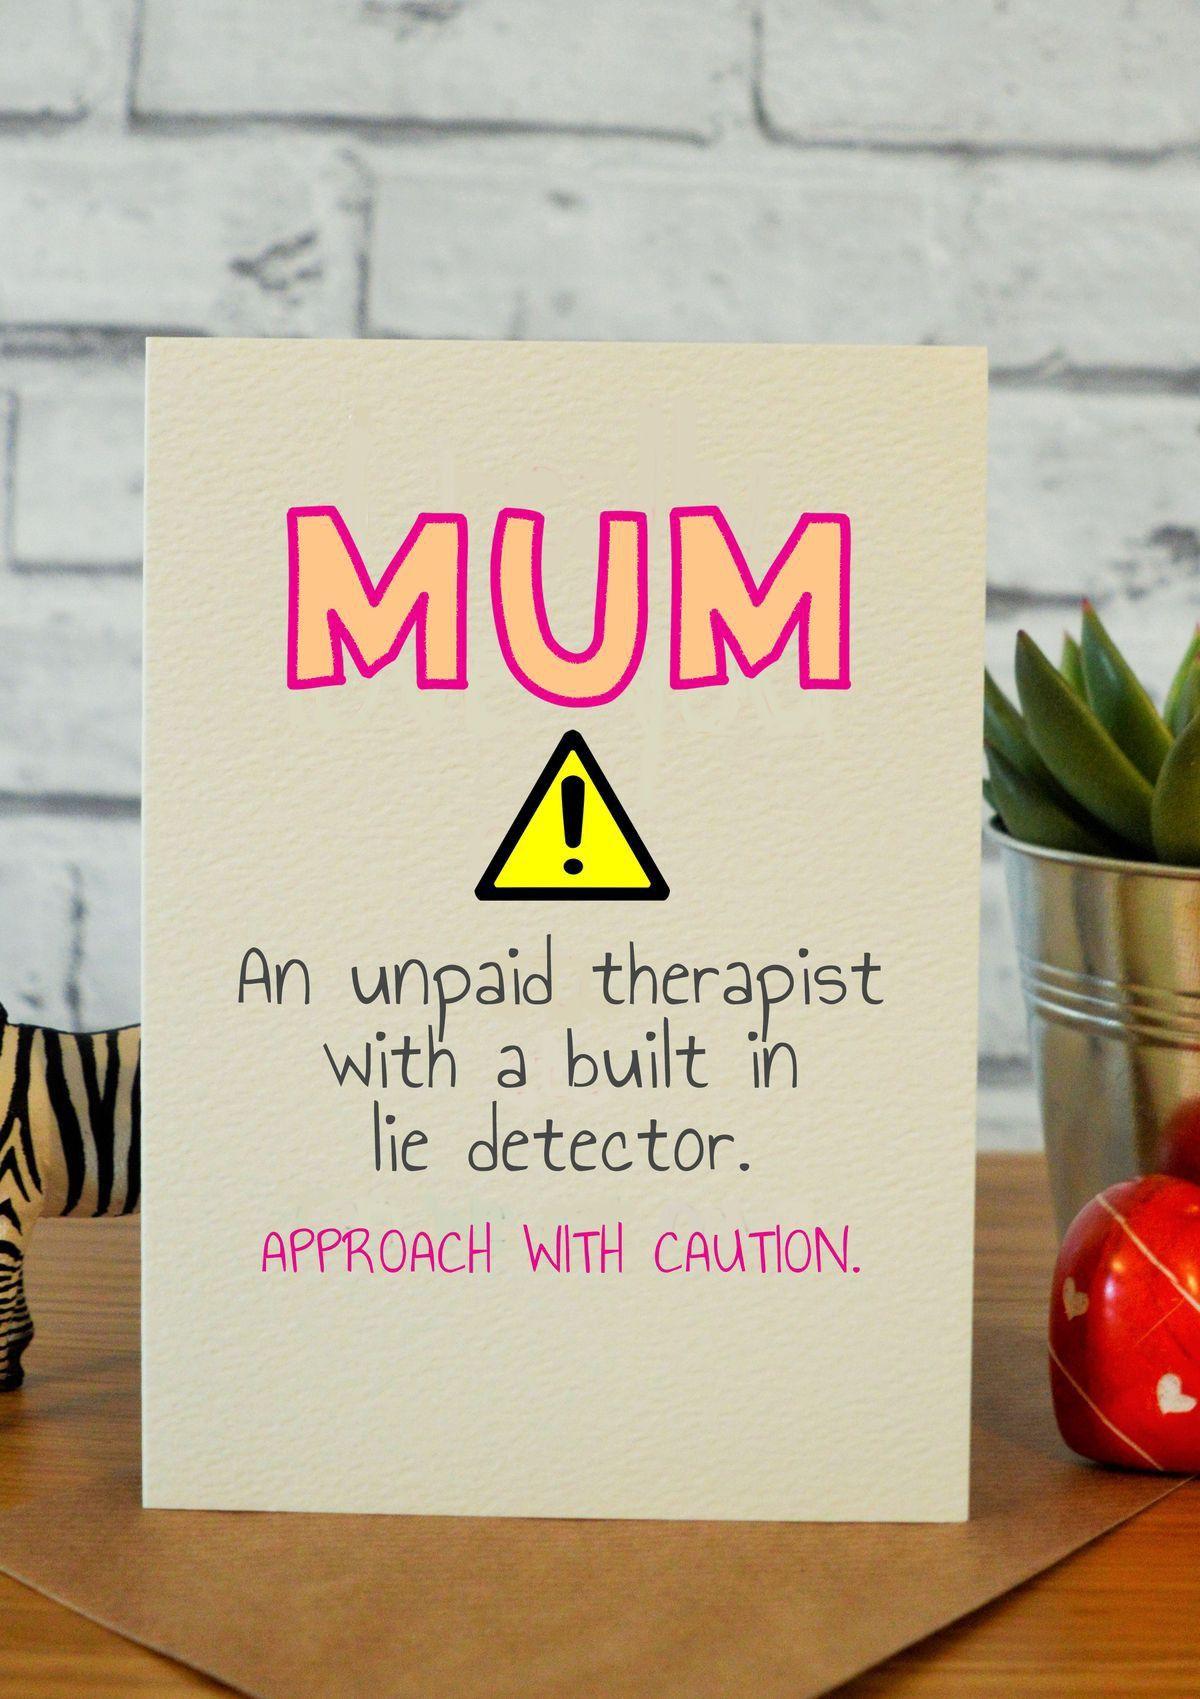 17 Funny Mom Birthday Cards Ideas In 2021 Birthday Cards Funny Birthday Cards Birthday Humor